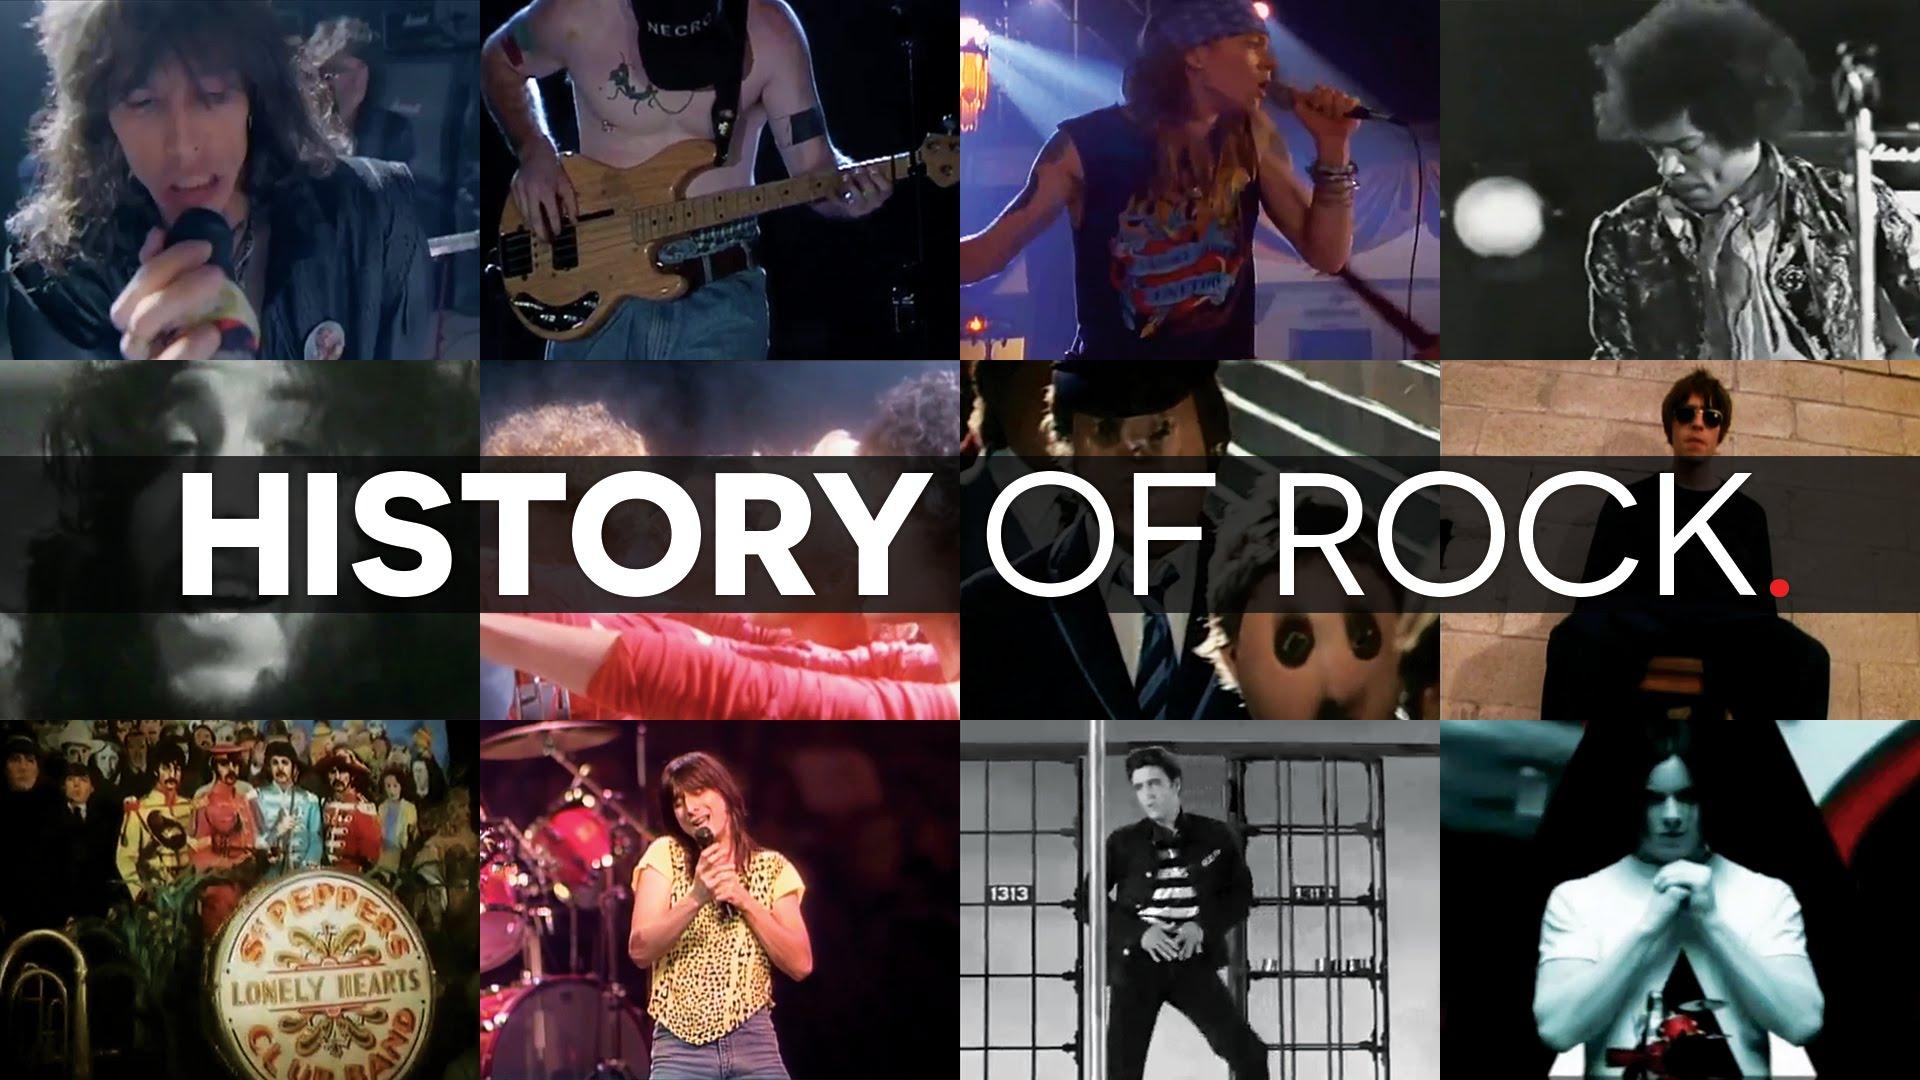 Historia del Rock en 15 minutos